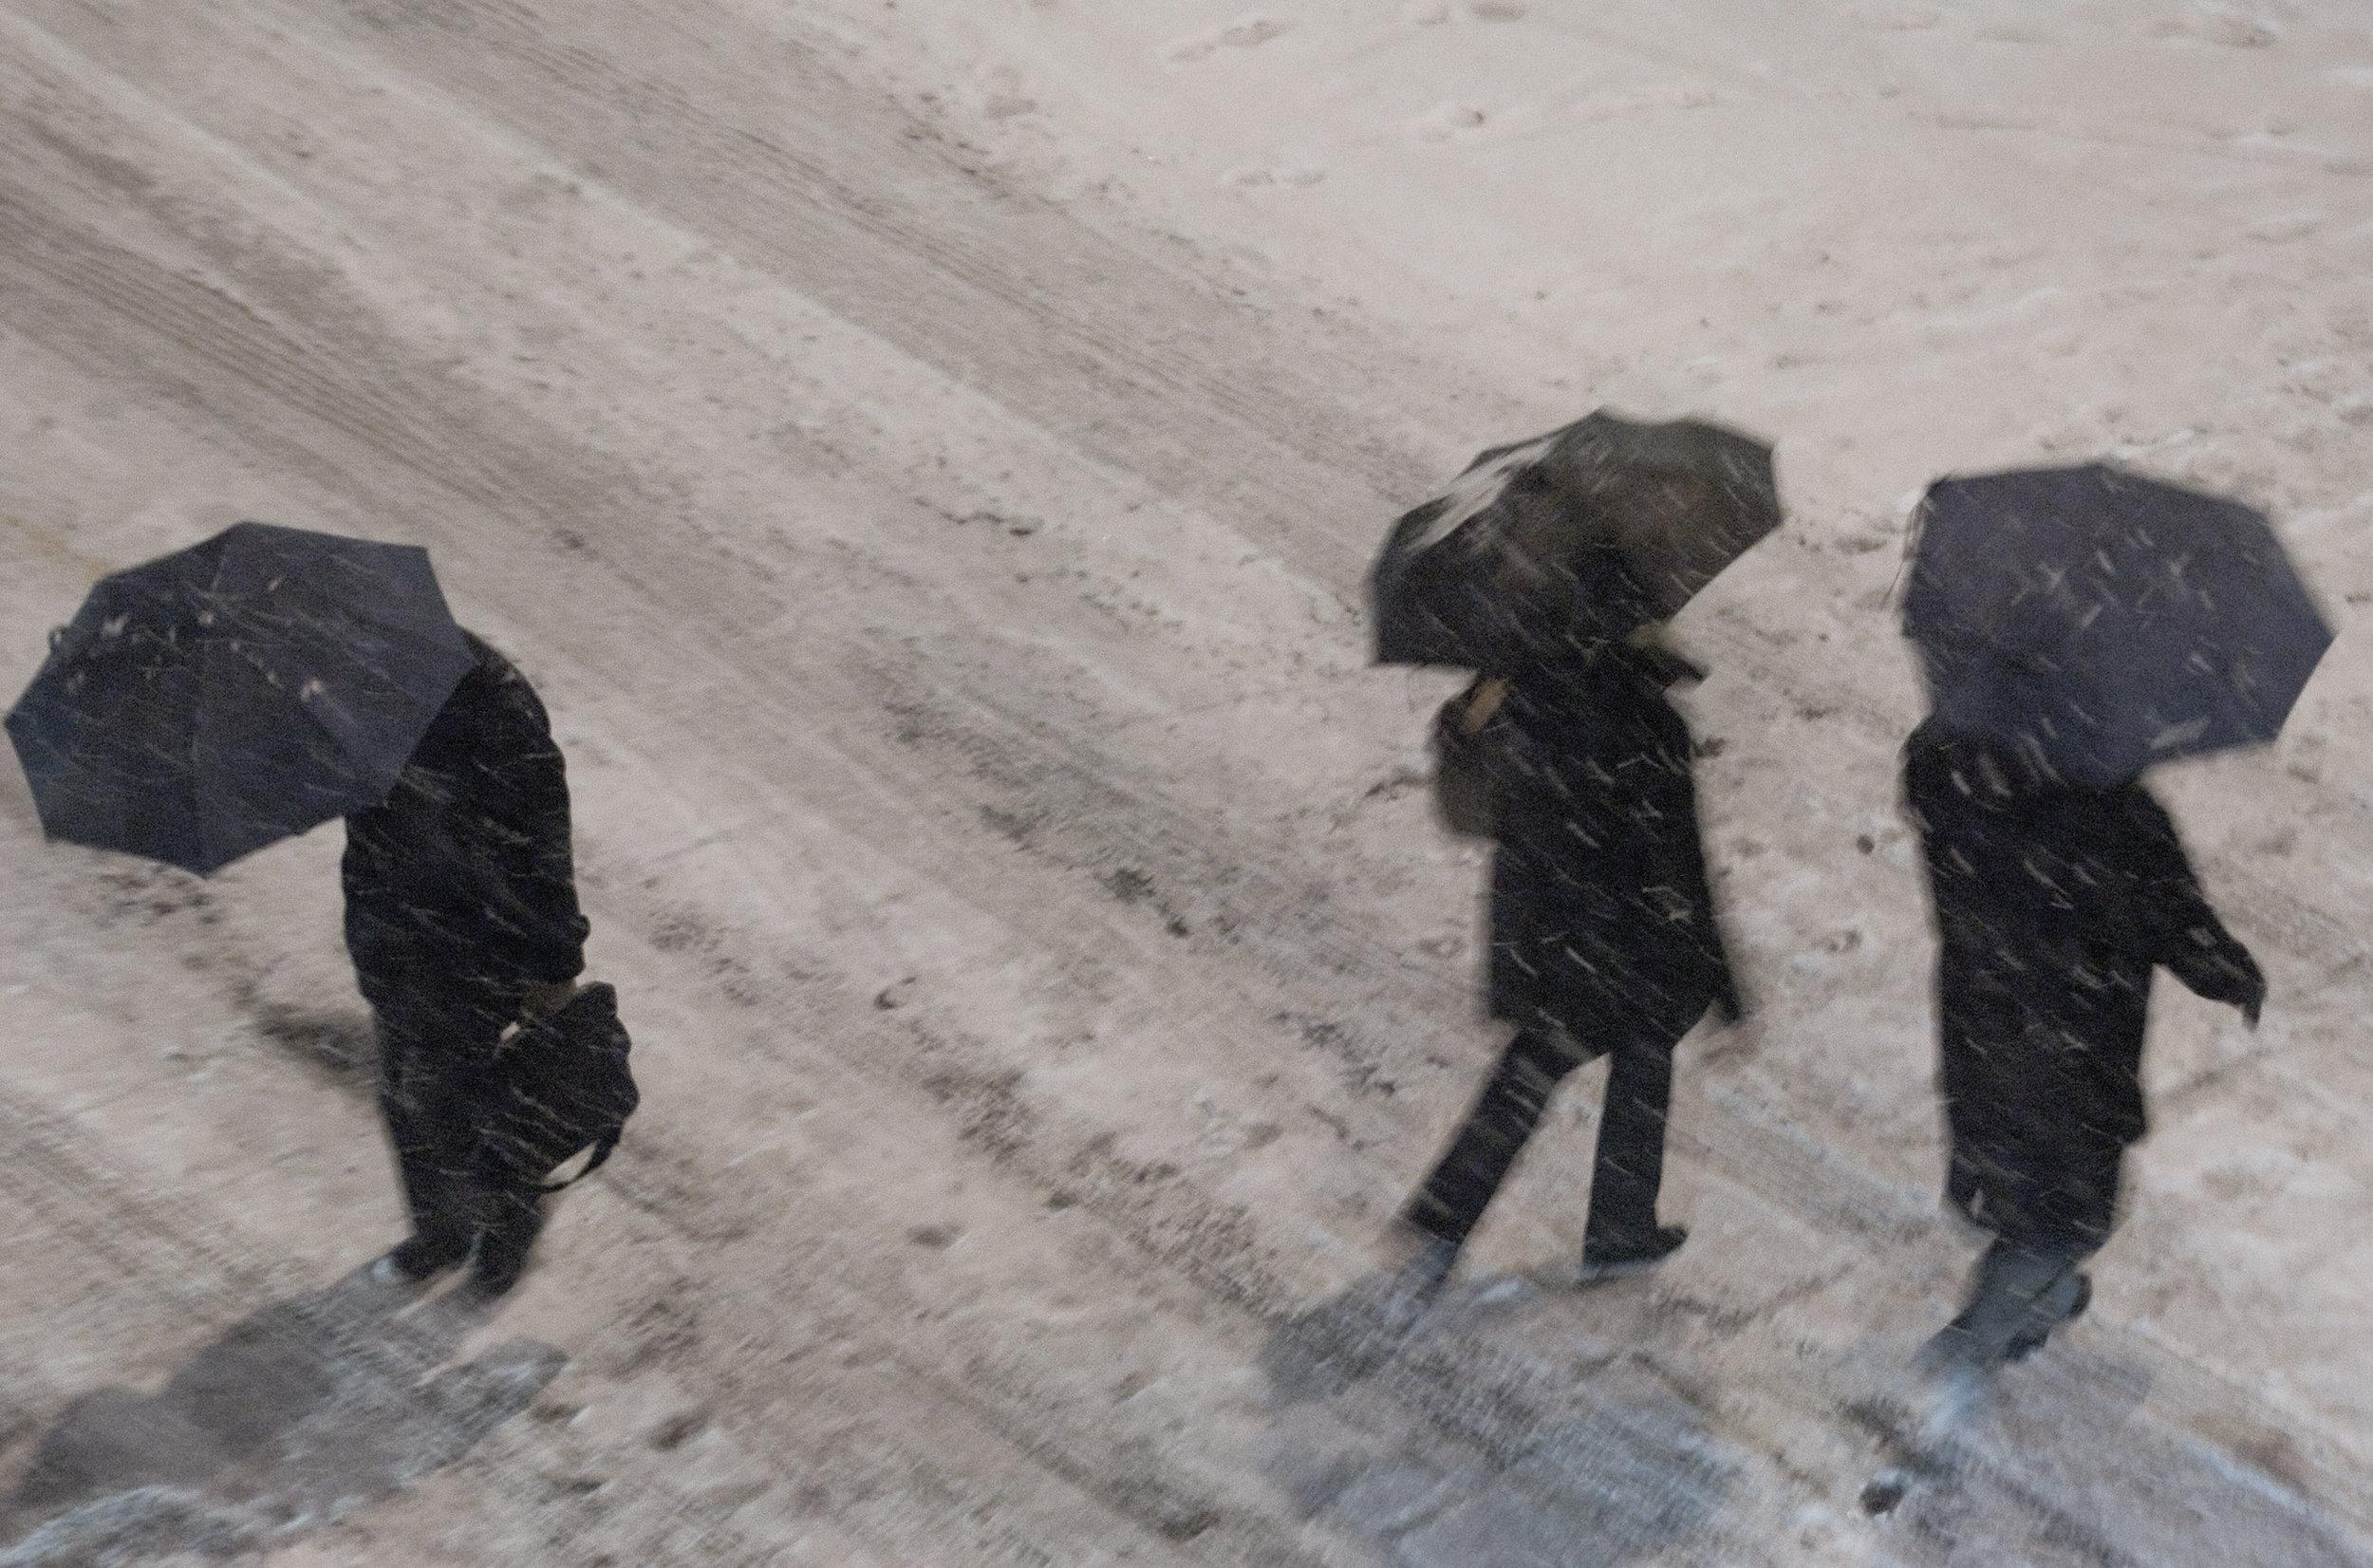 Winter-Scene-Umbrellas.jpg